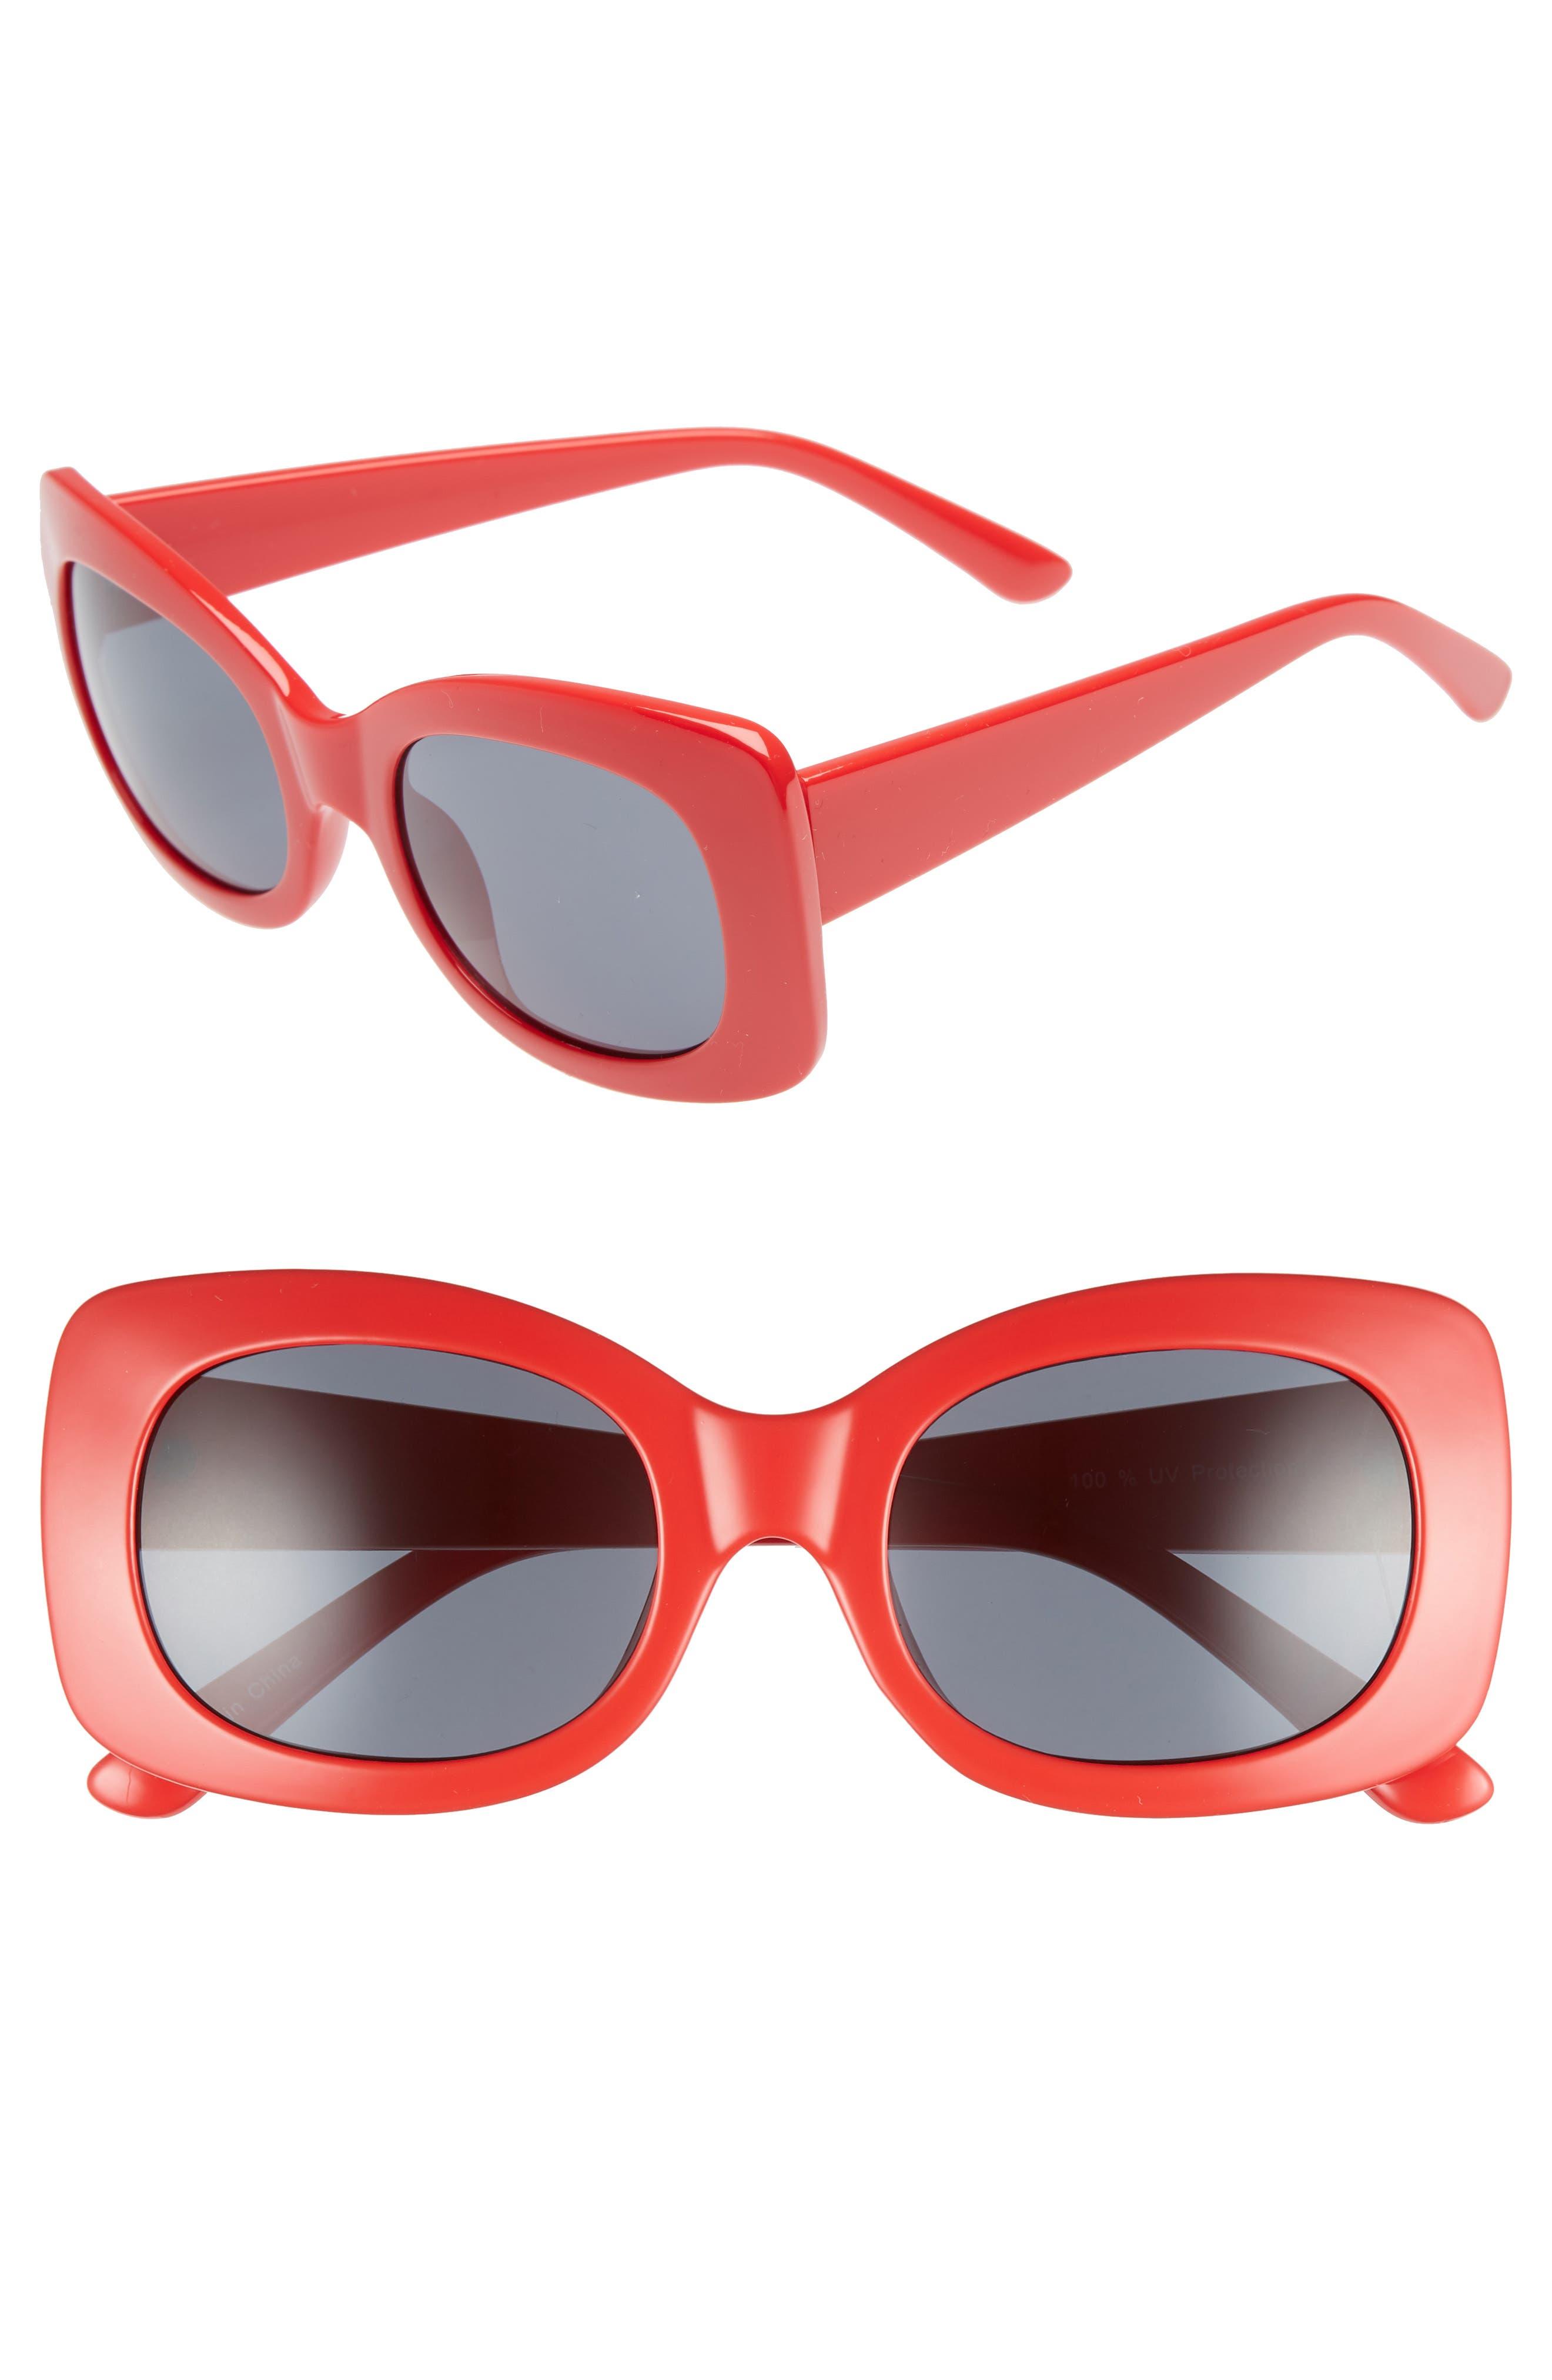 51mm Square Sunglasses,                             Main thumbnail 1, color,                             Red/ Black